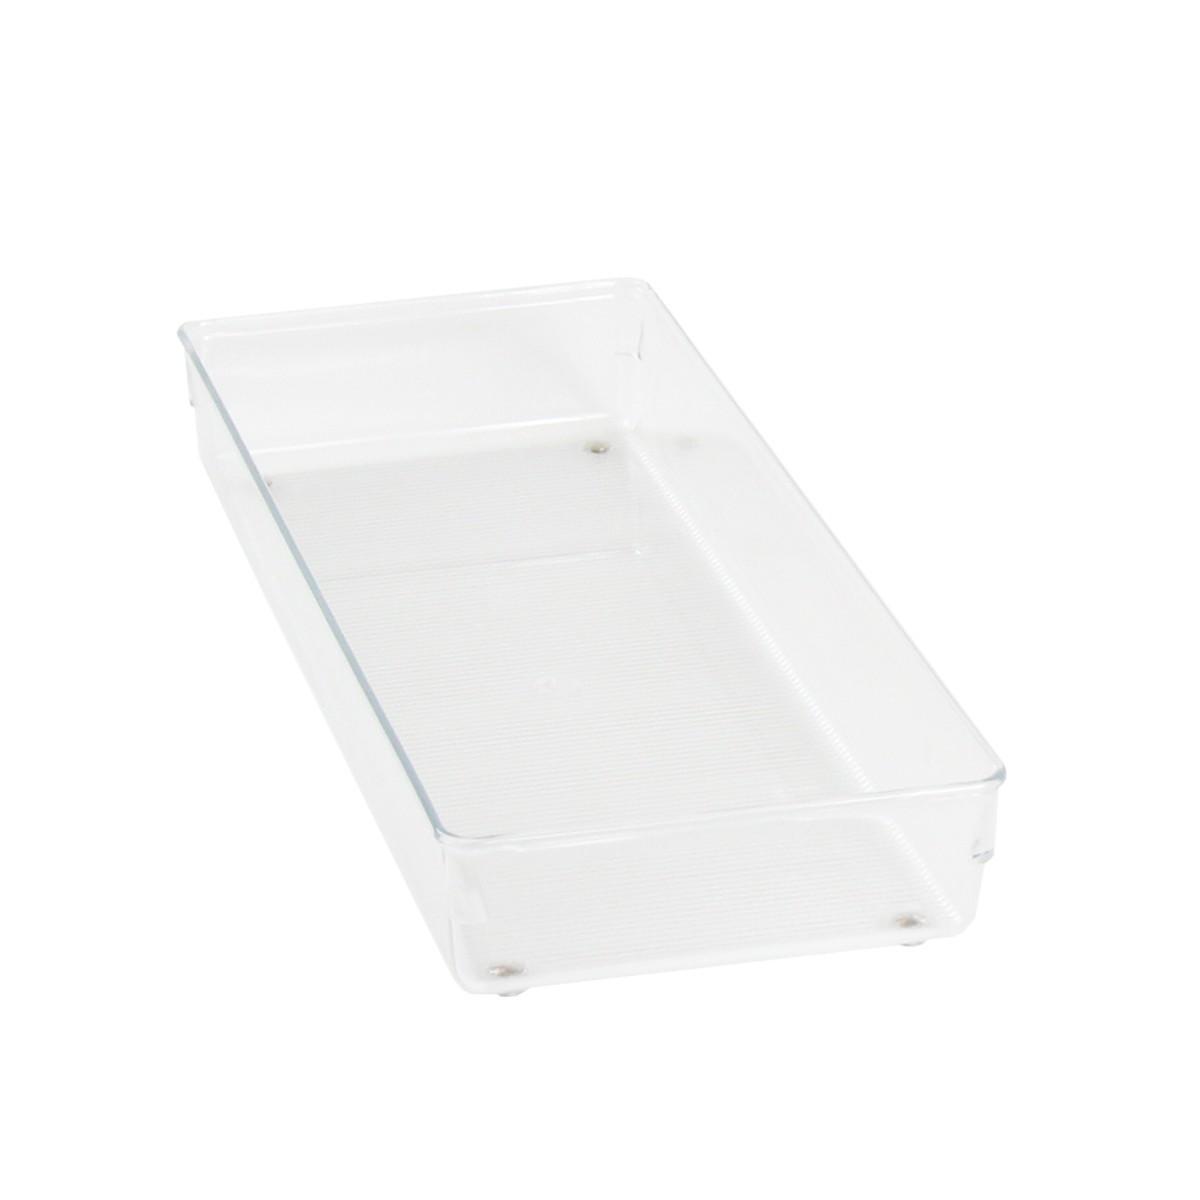 organisateur de tiroir en acrylique xl organisation cuisine. Black Bedroom Furniture Sets. Home Design Ideas